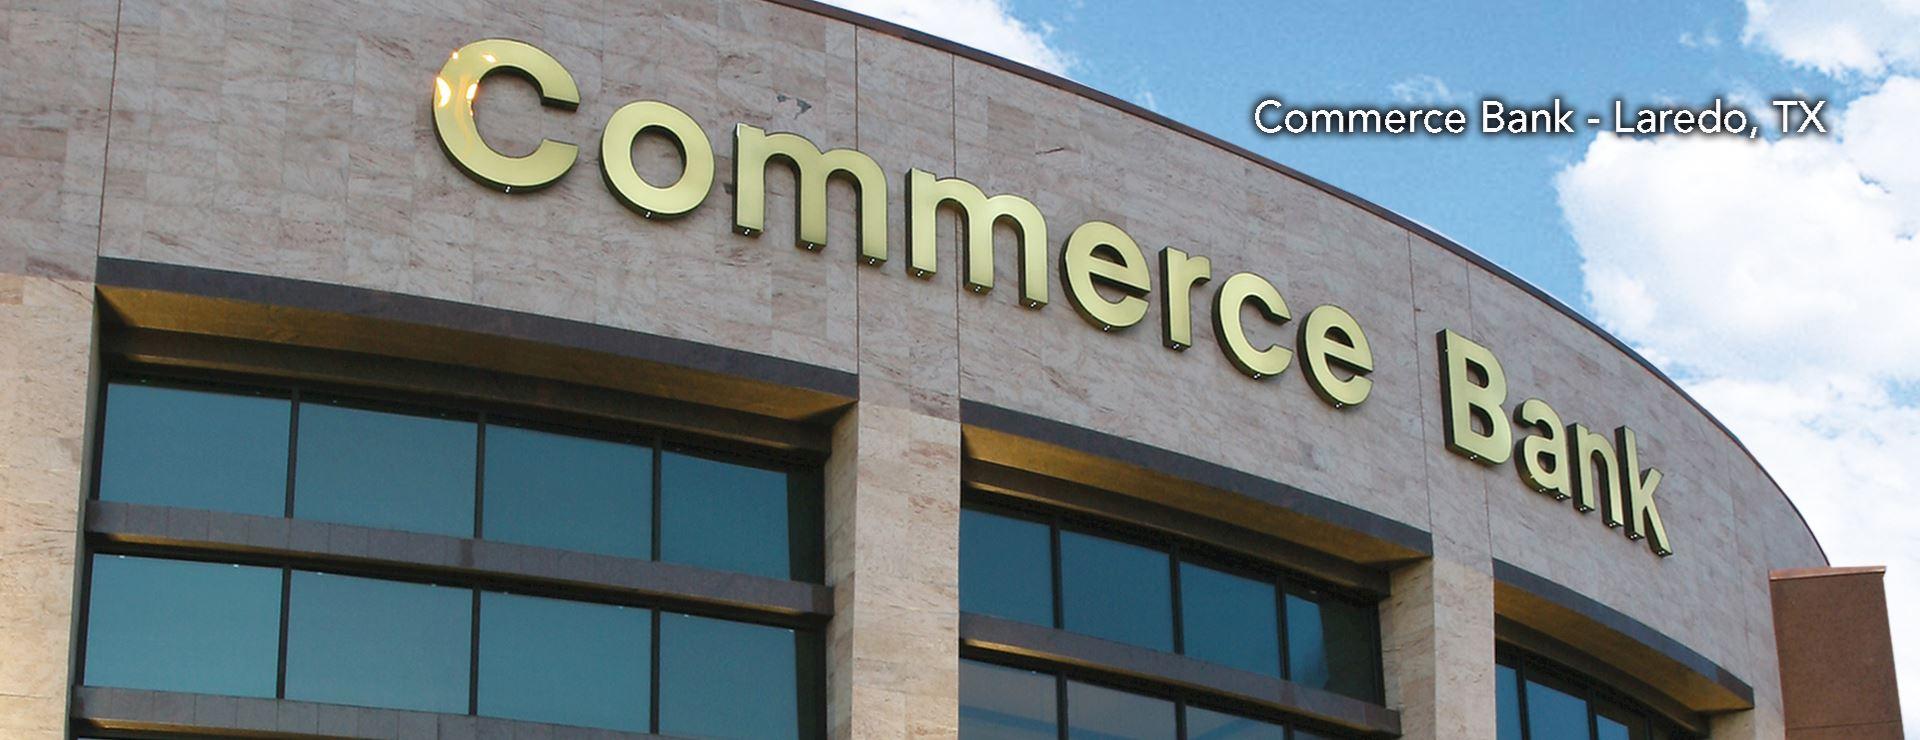 commerce-bank-image2